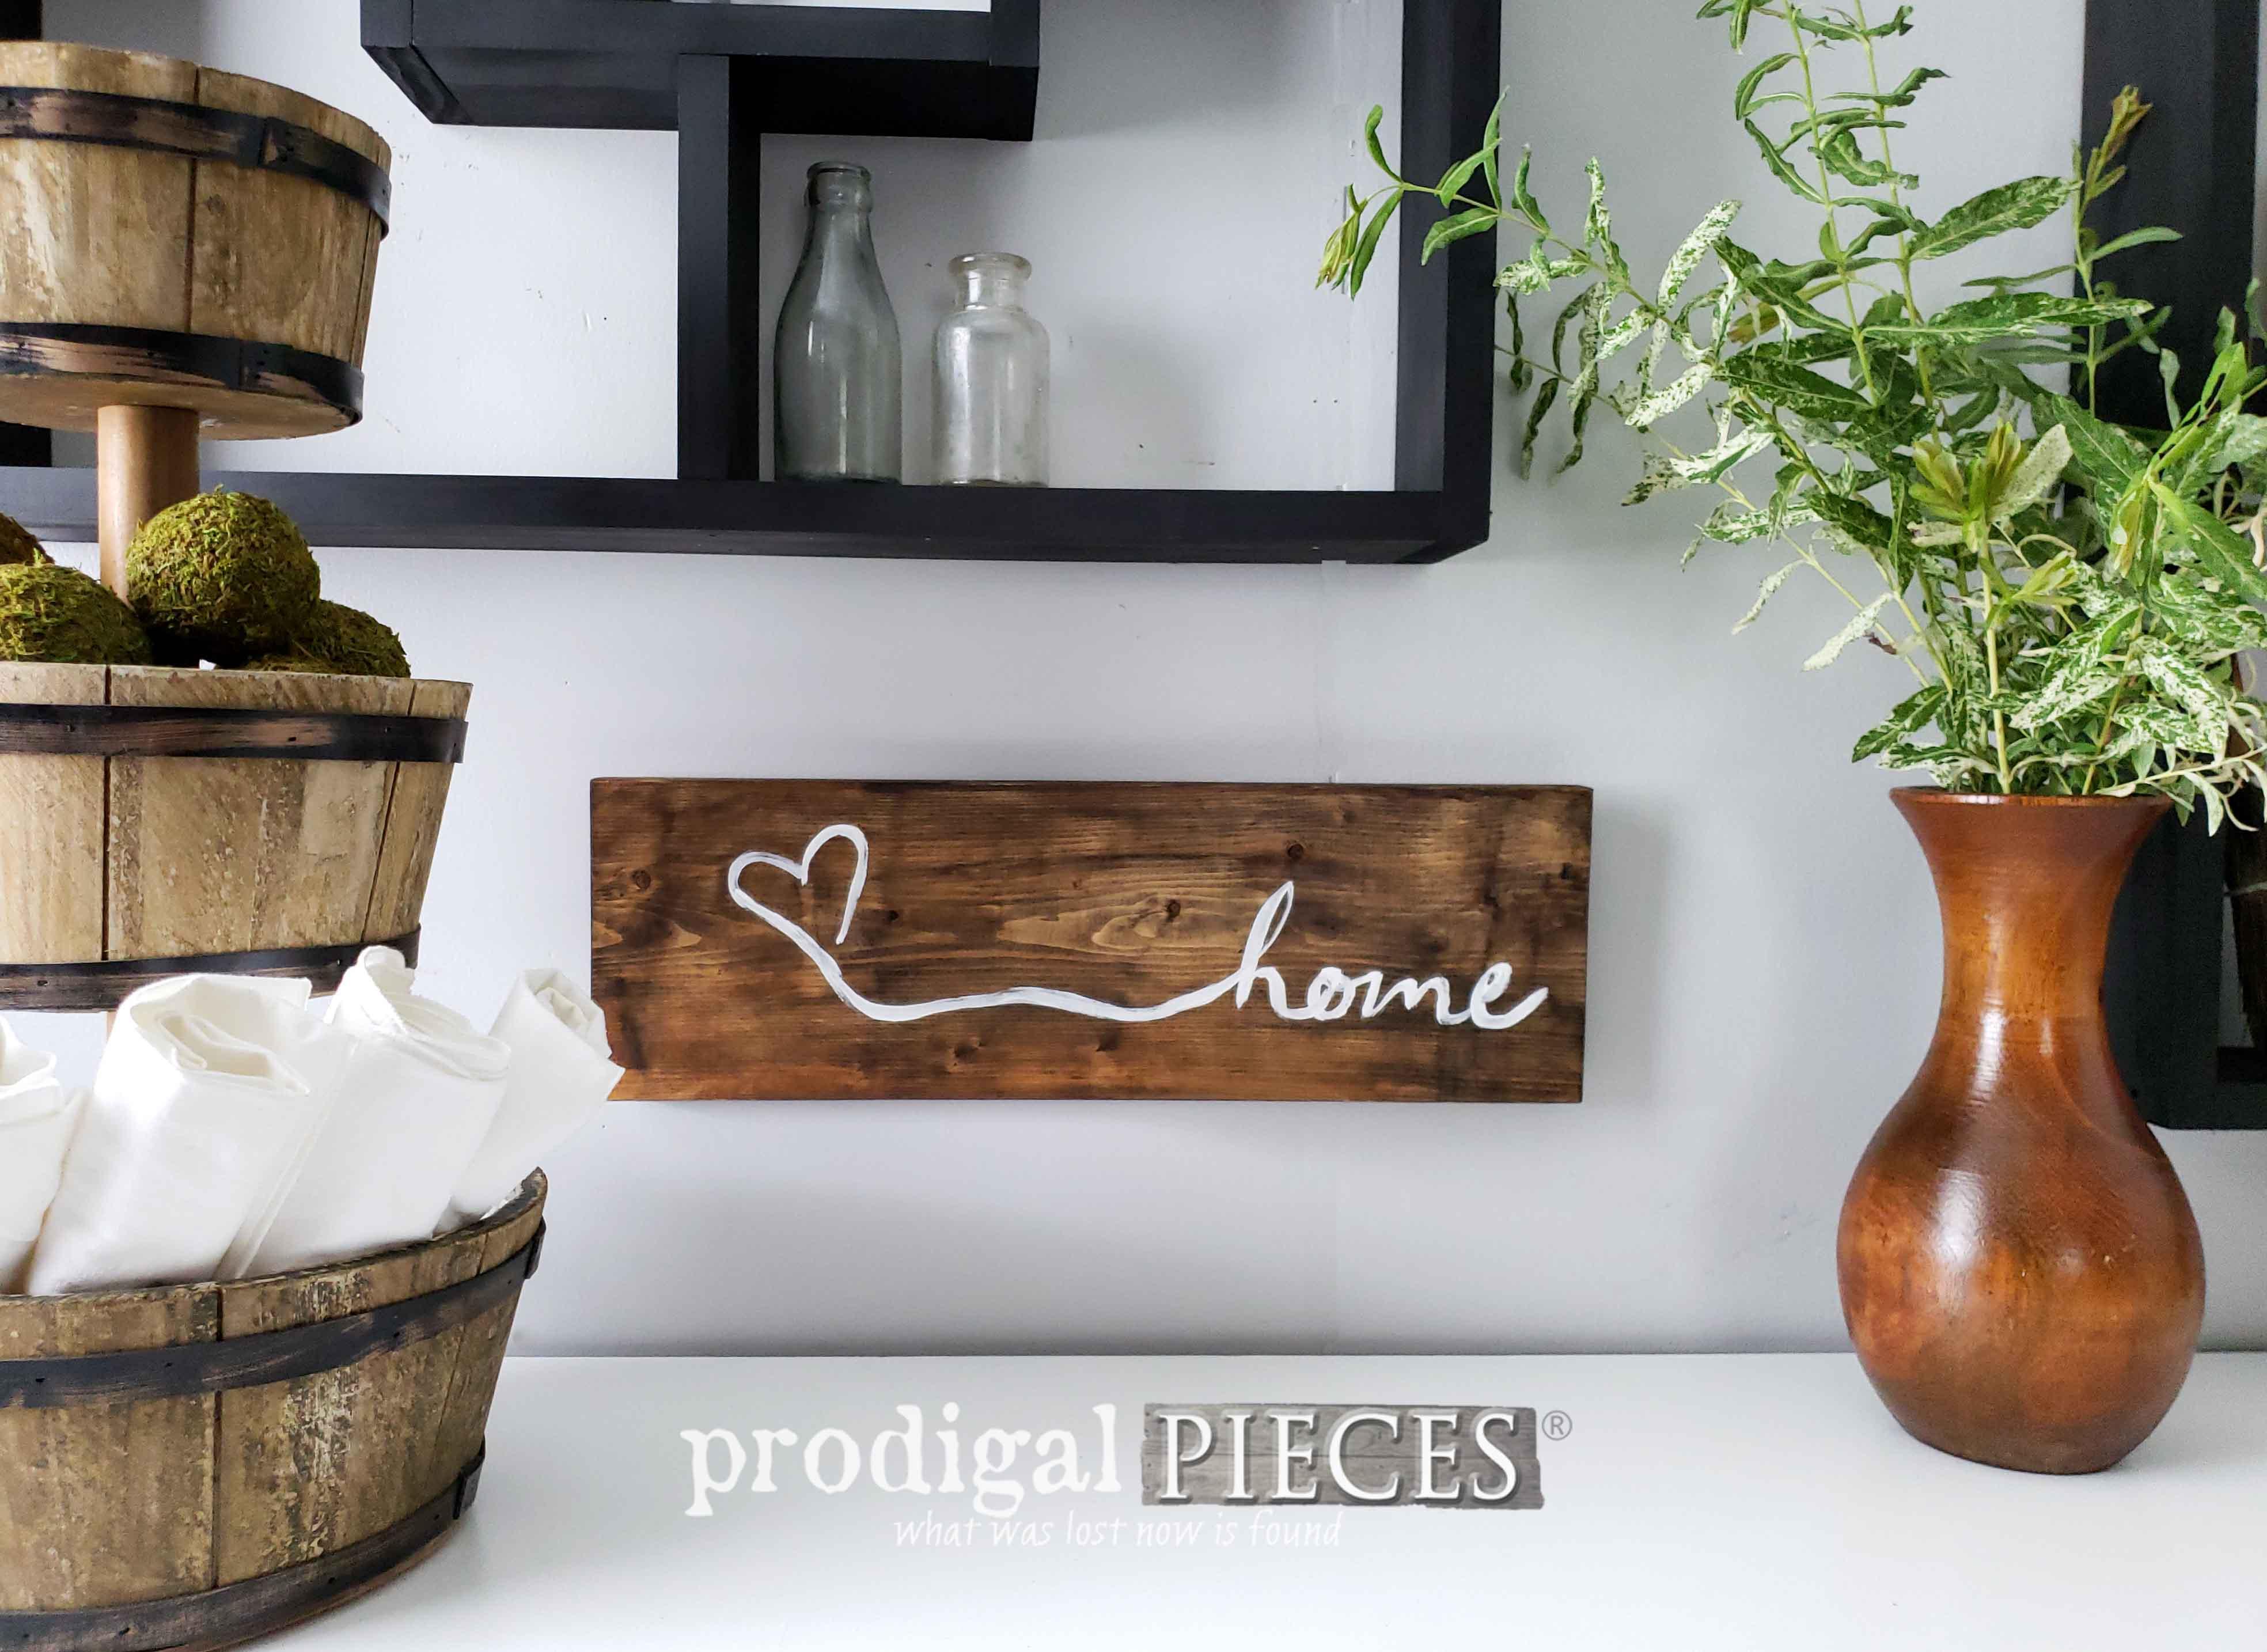 Rustic Farmhouse Home Sign   Handmade Decor Available at Prodigal Pieces   shop.prodigalpieces.com